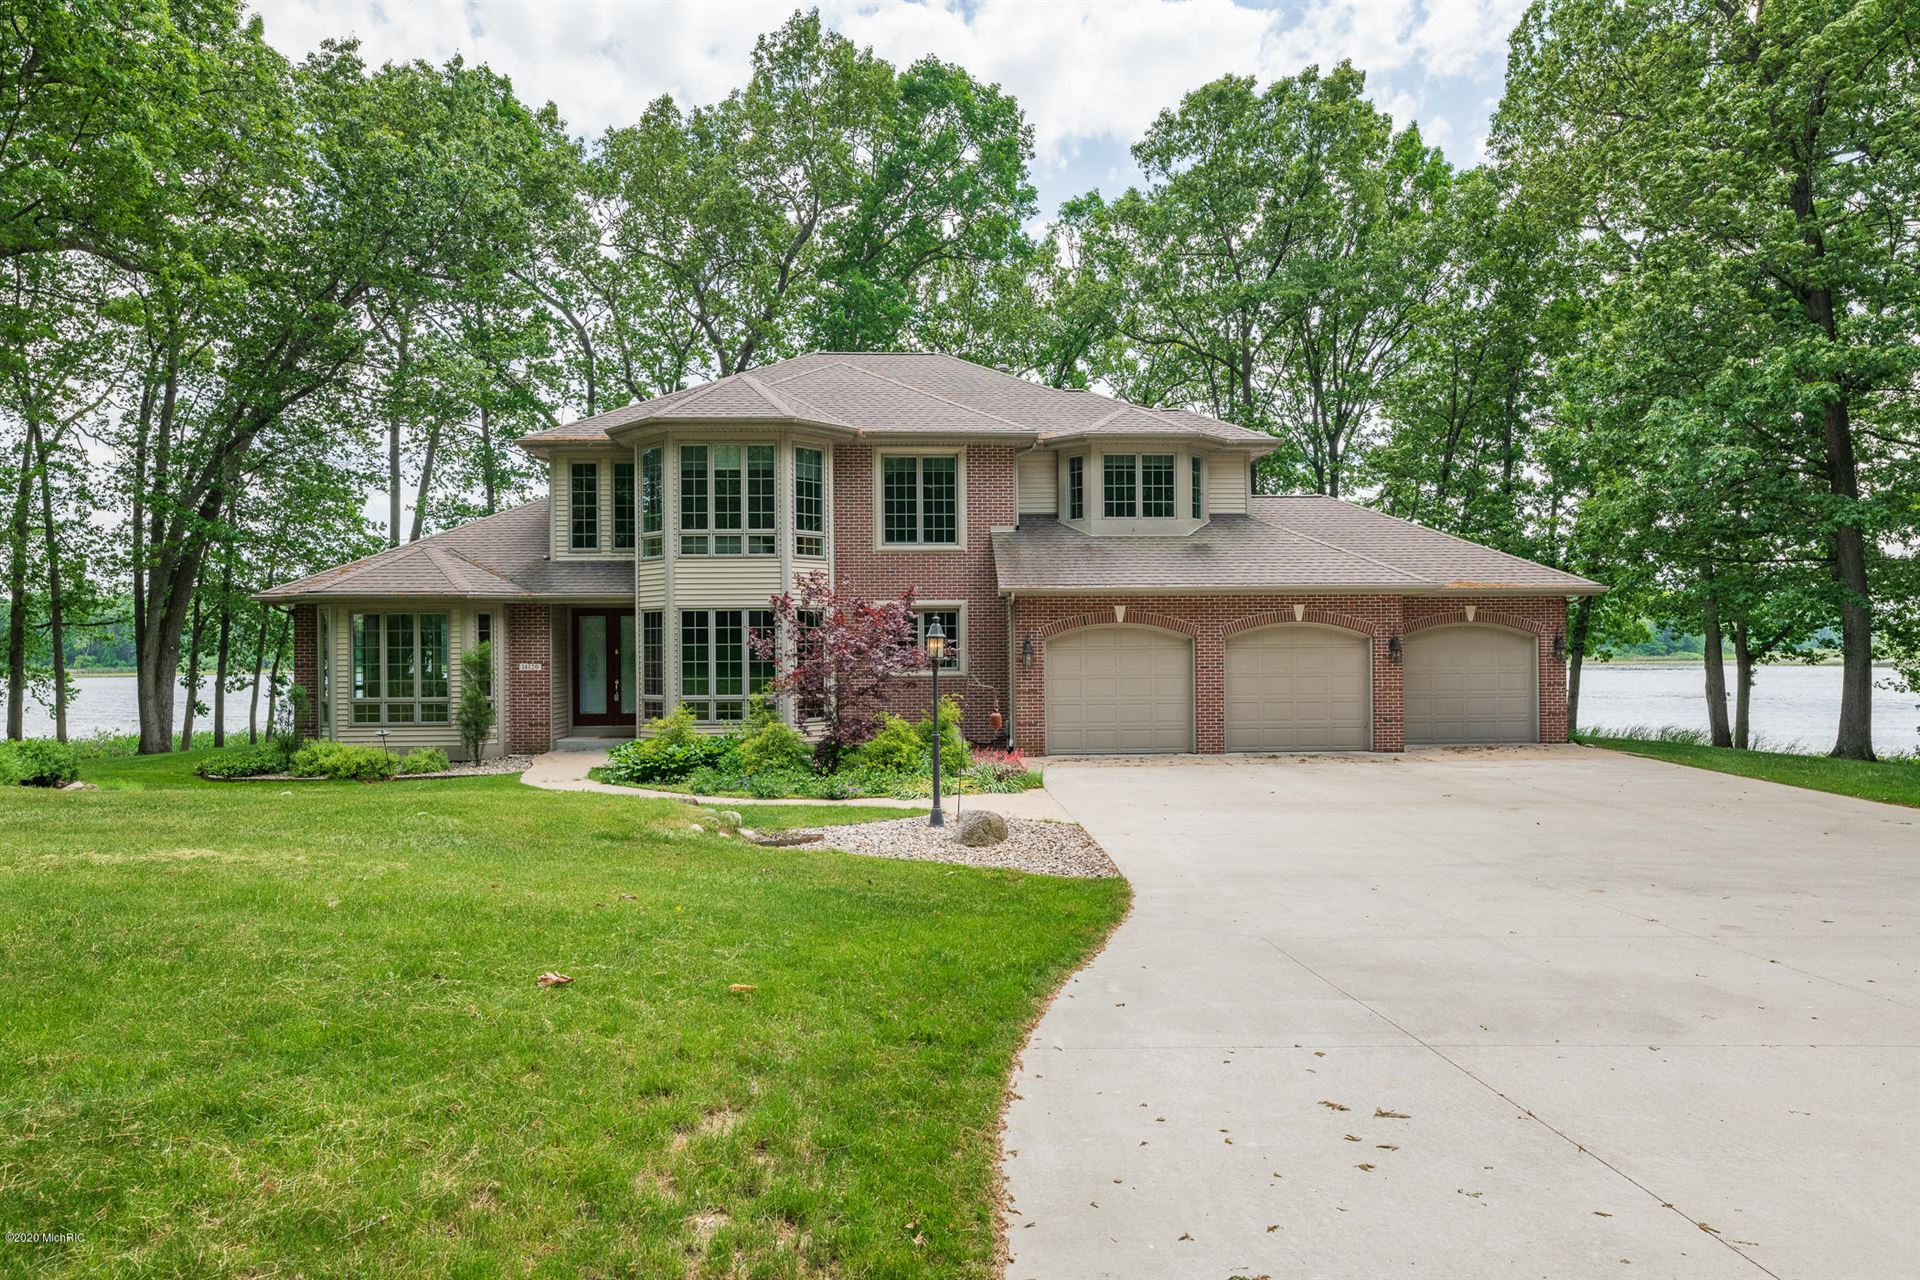 14120 Peninsula Drive, Galesburg, MI 49053 - MLS#: 20021960